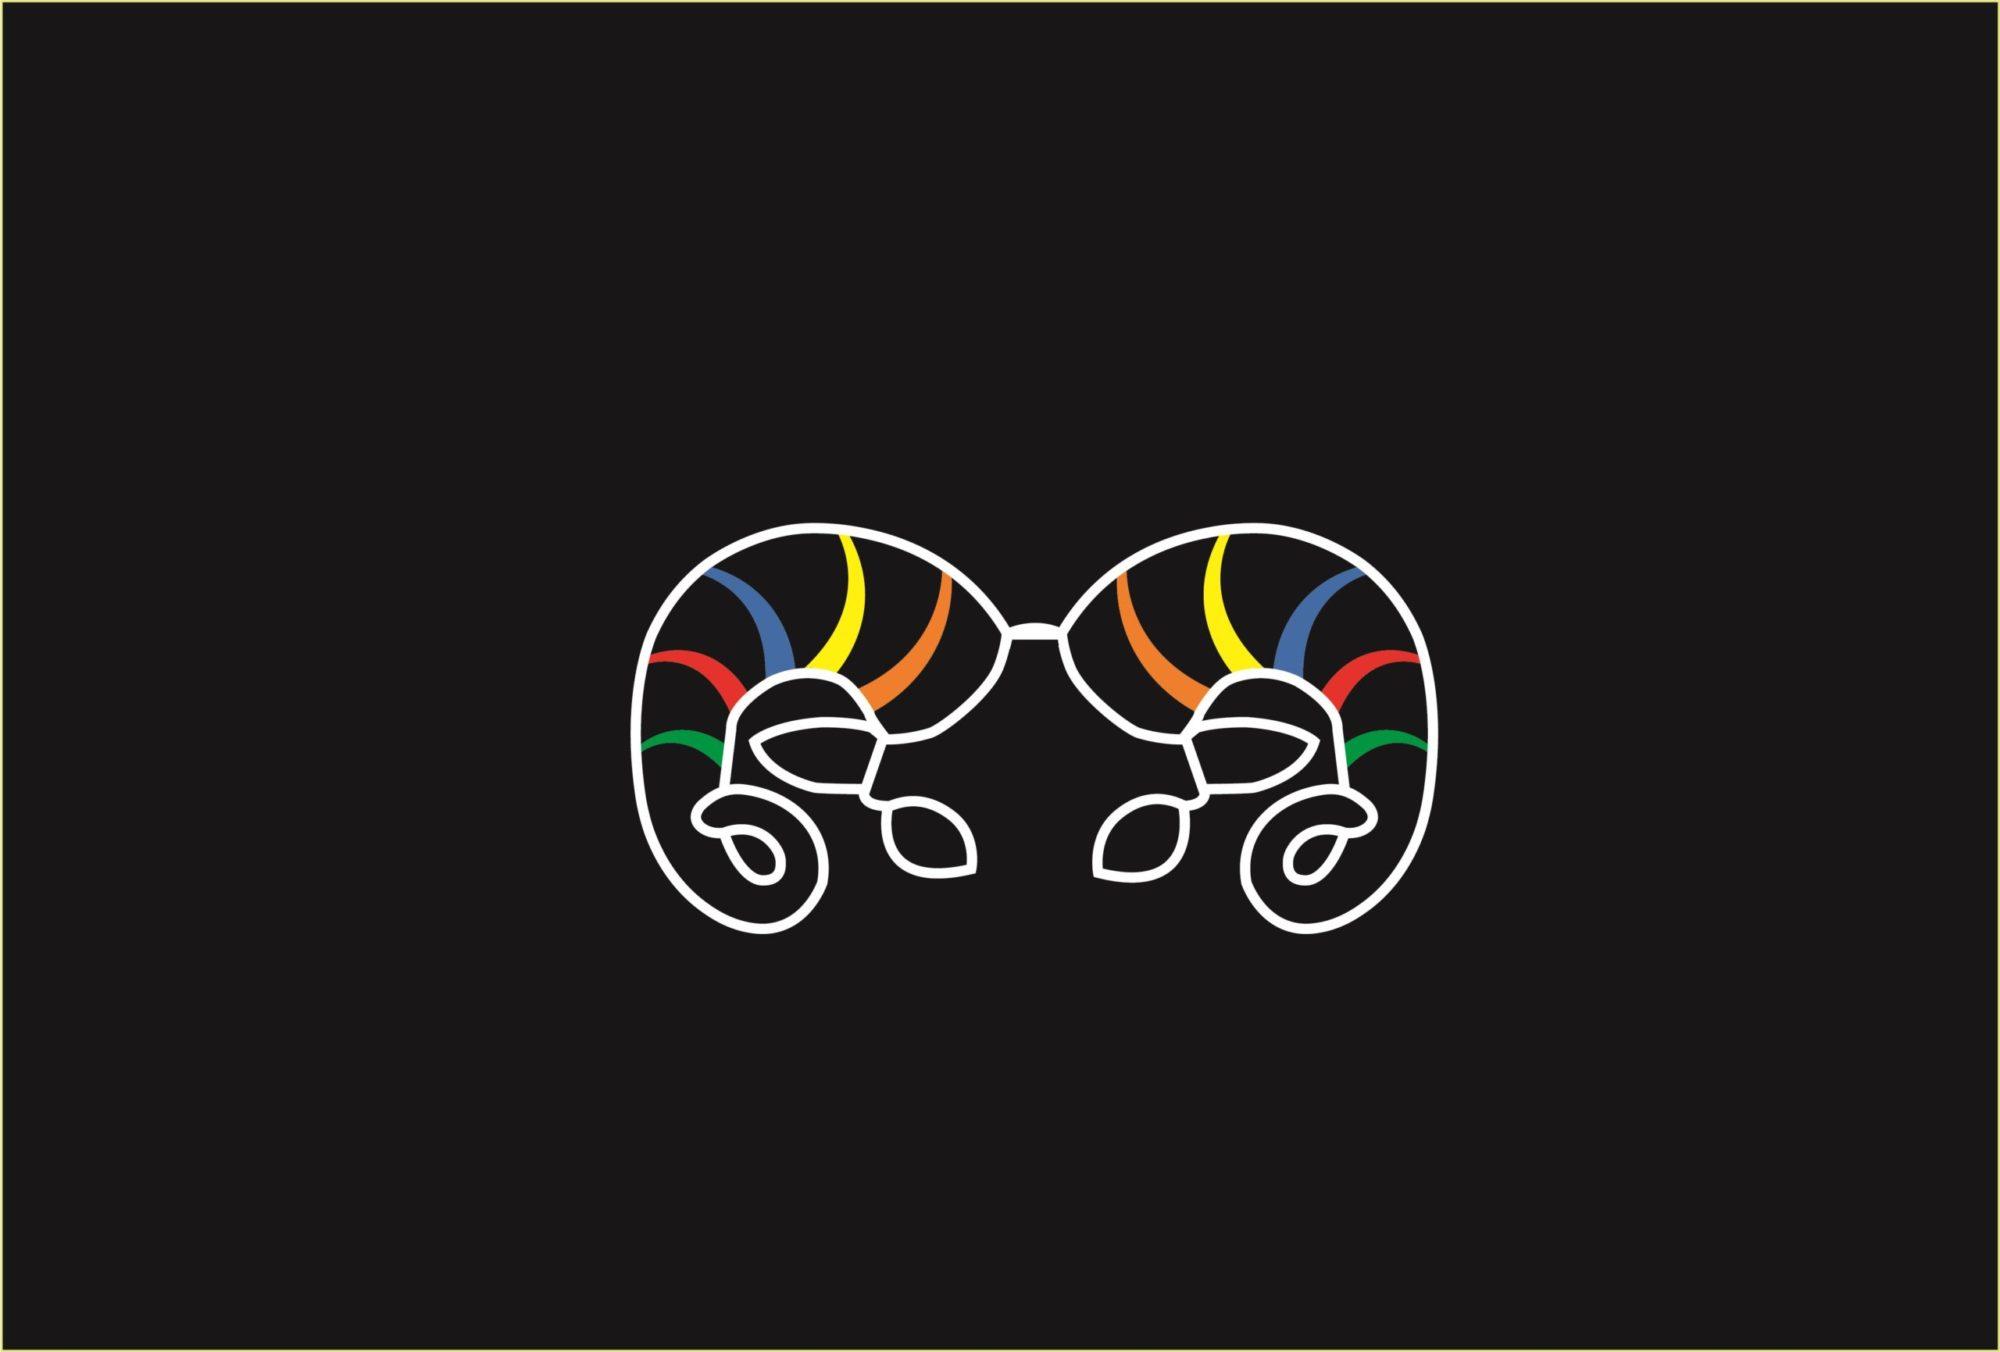 Jeux de Bretagne - C'Hoarioù Breizh